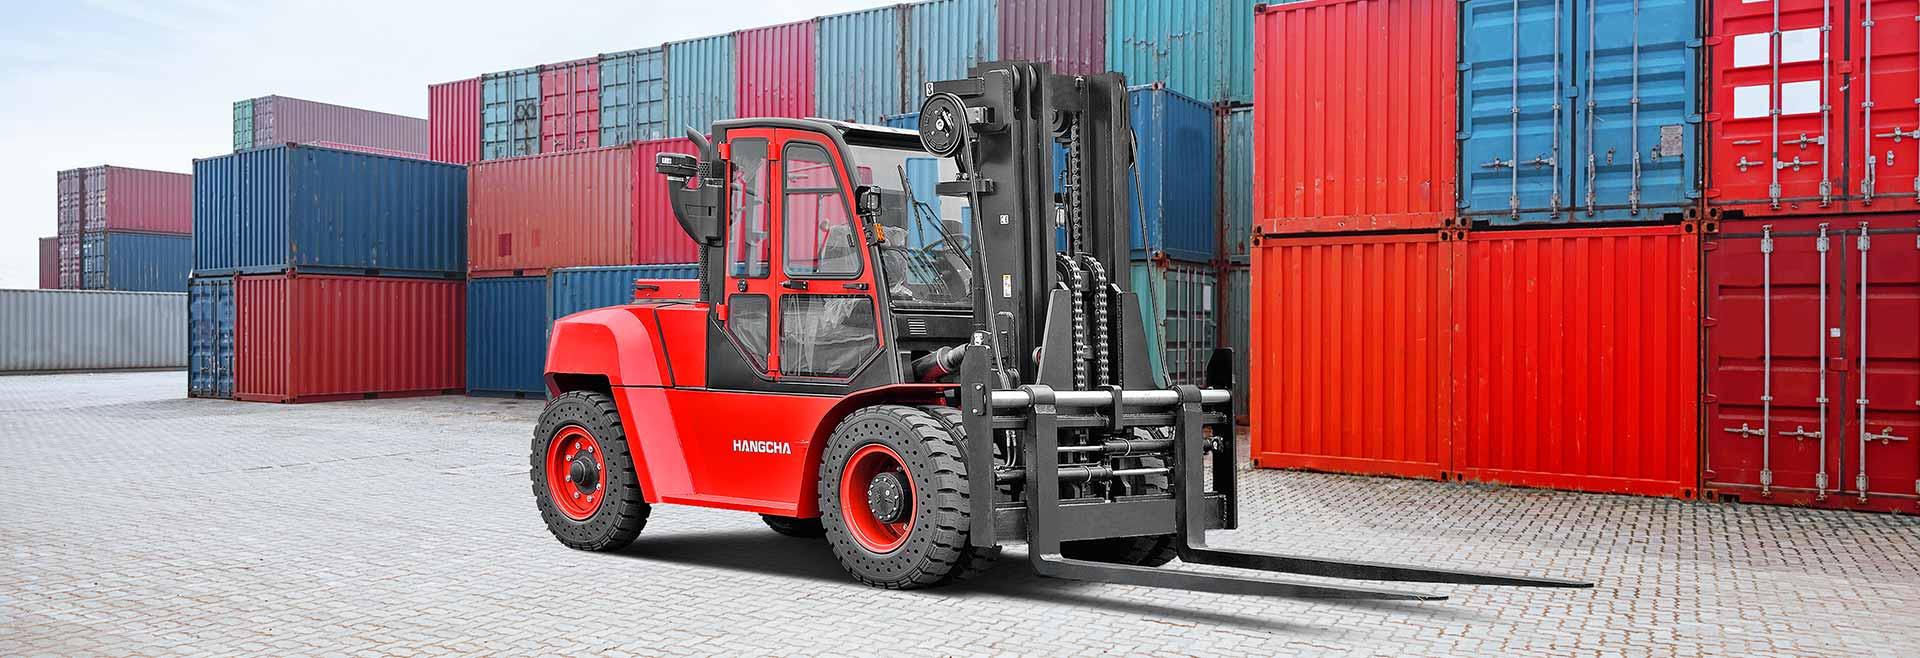 XF Forklift